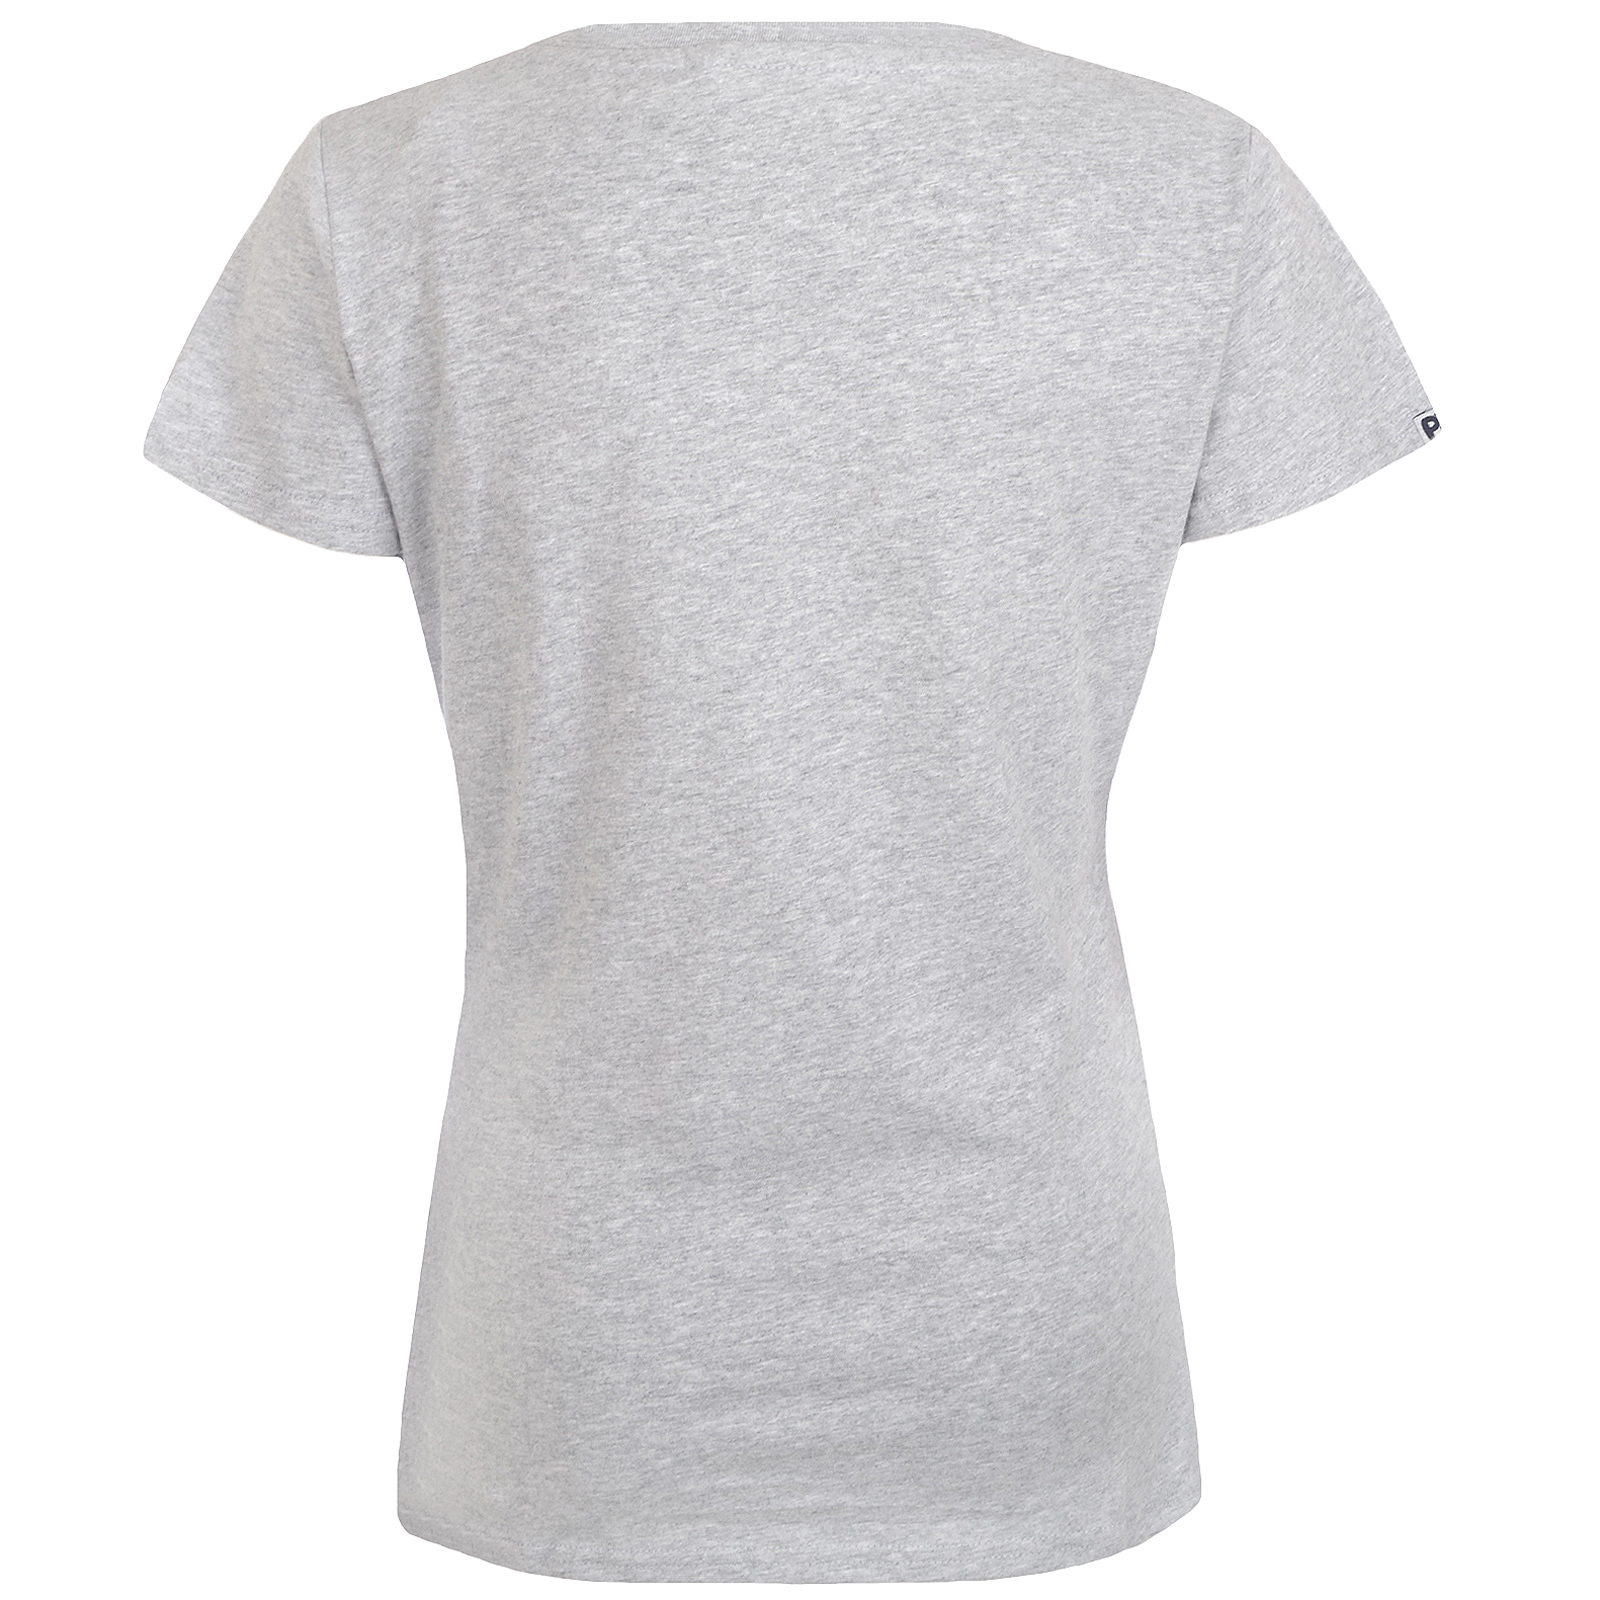 Puffa Womens Short Sleeve Crewneck Slim Fit Casual T Shirt Tee Top